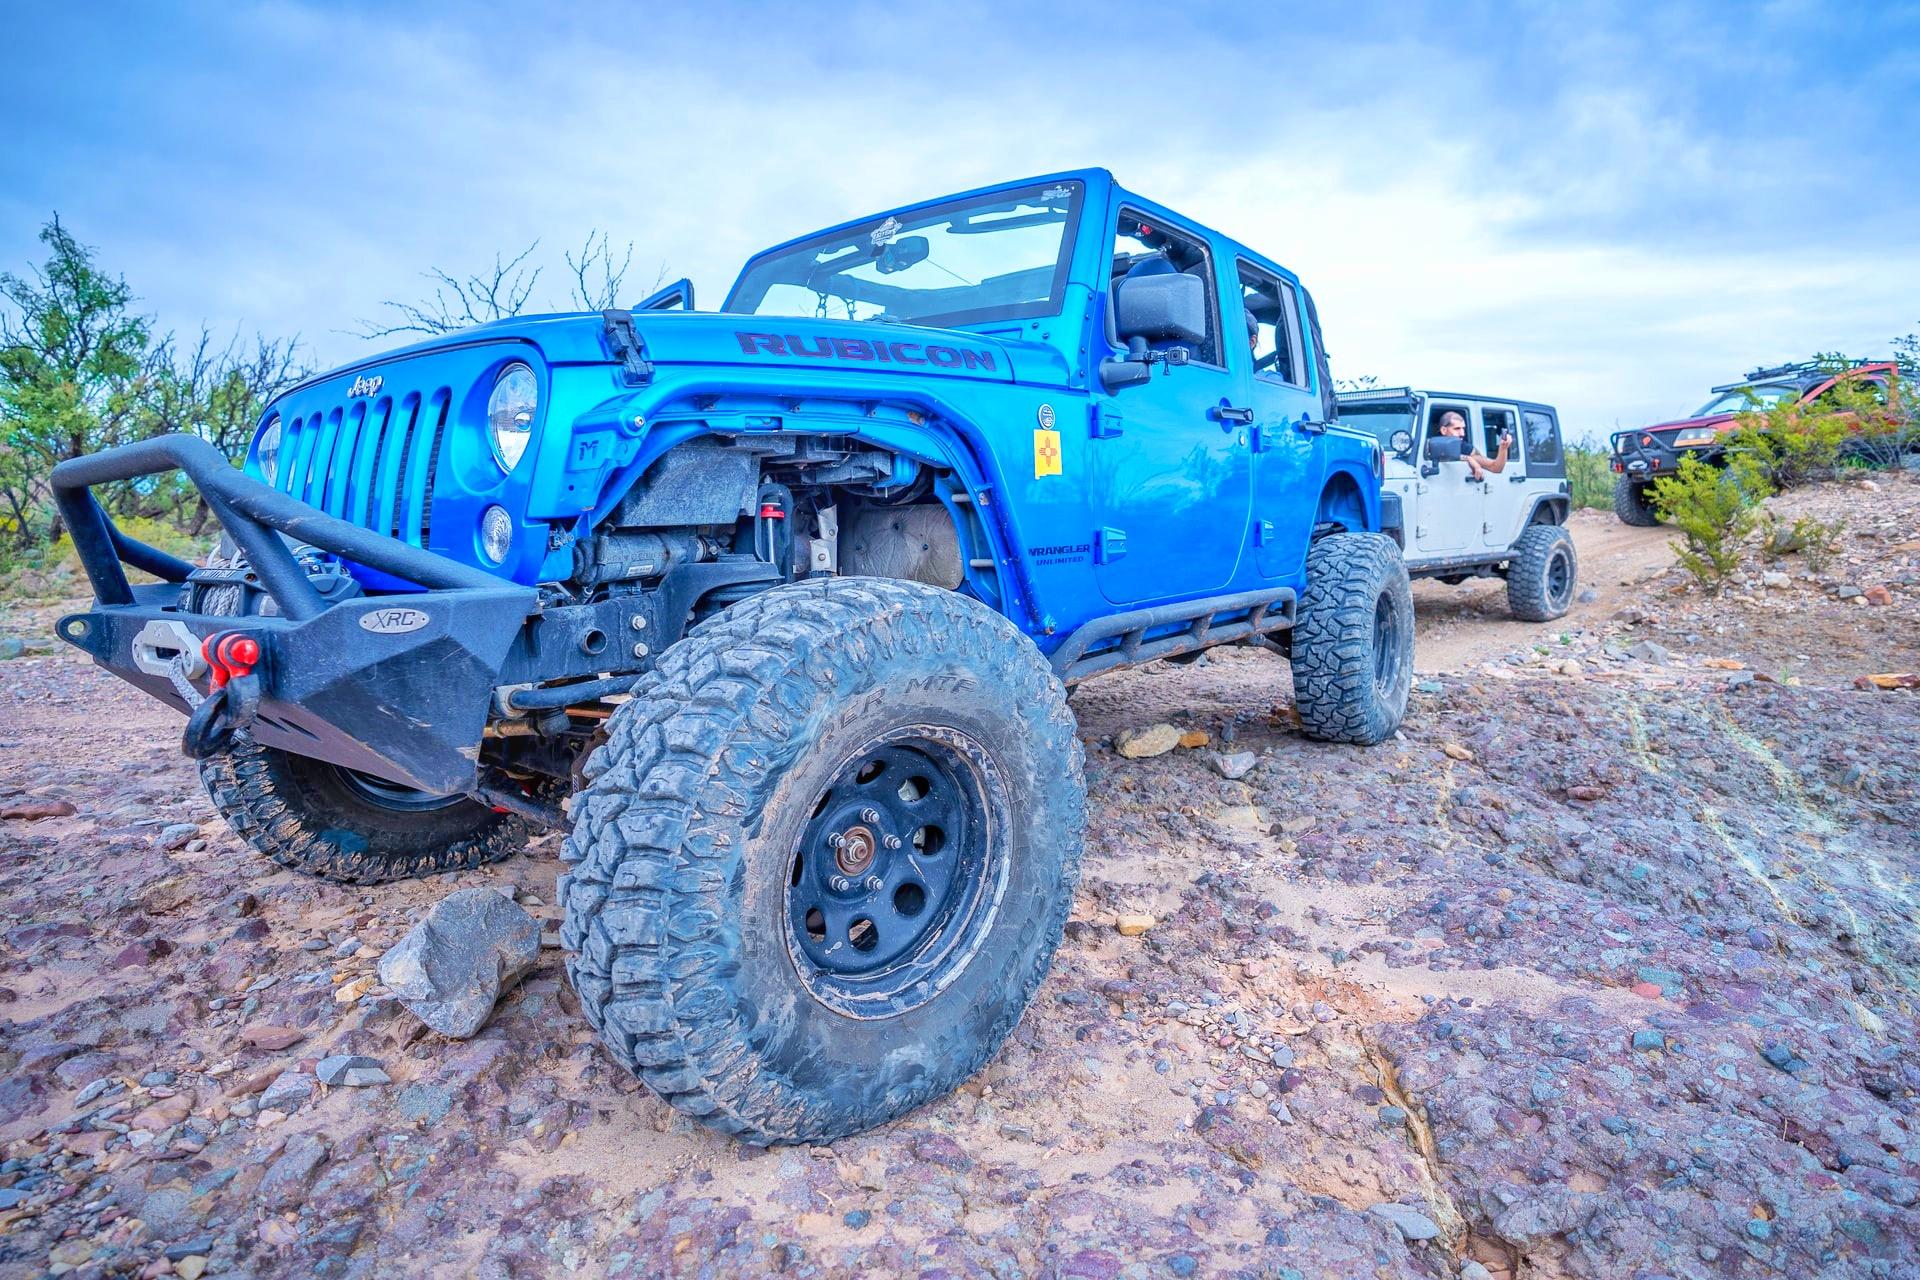 Jeep, wrangler, blue color